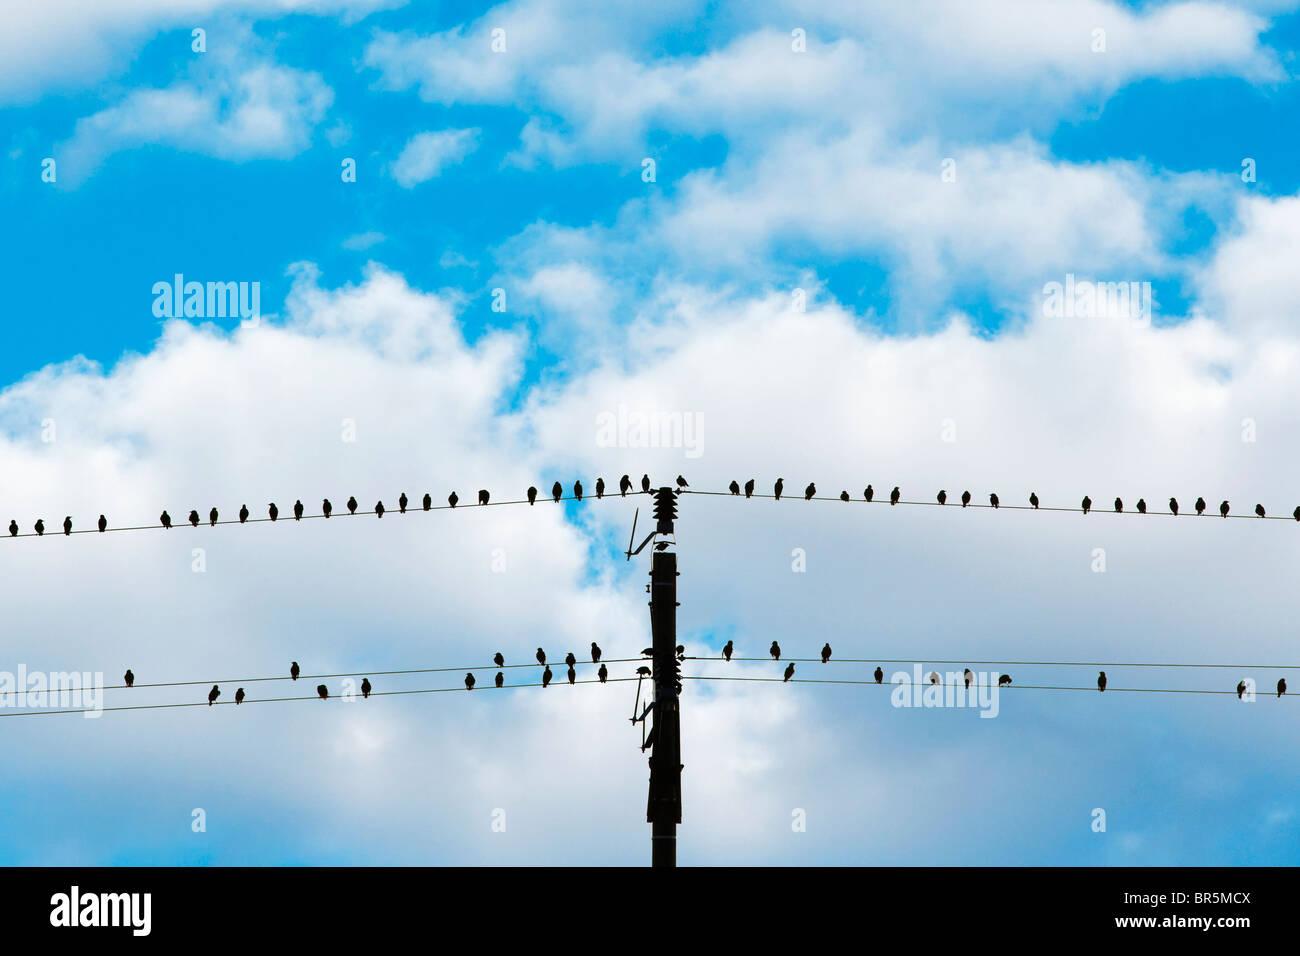 Gli uccelli seduti sui conduttori di elettricità - cielo blu e nuvole bianche Immagini Stock